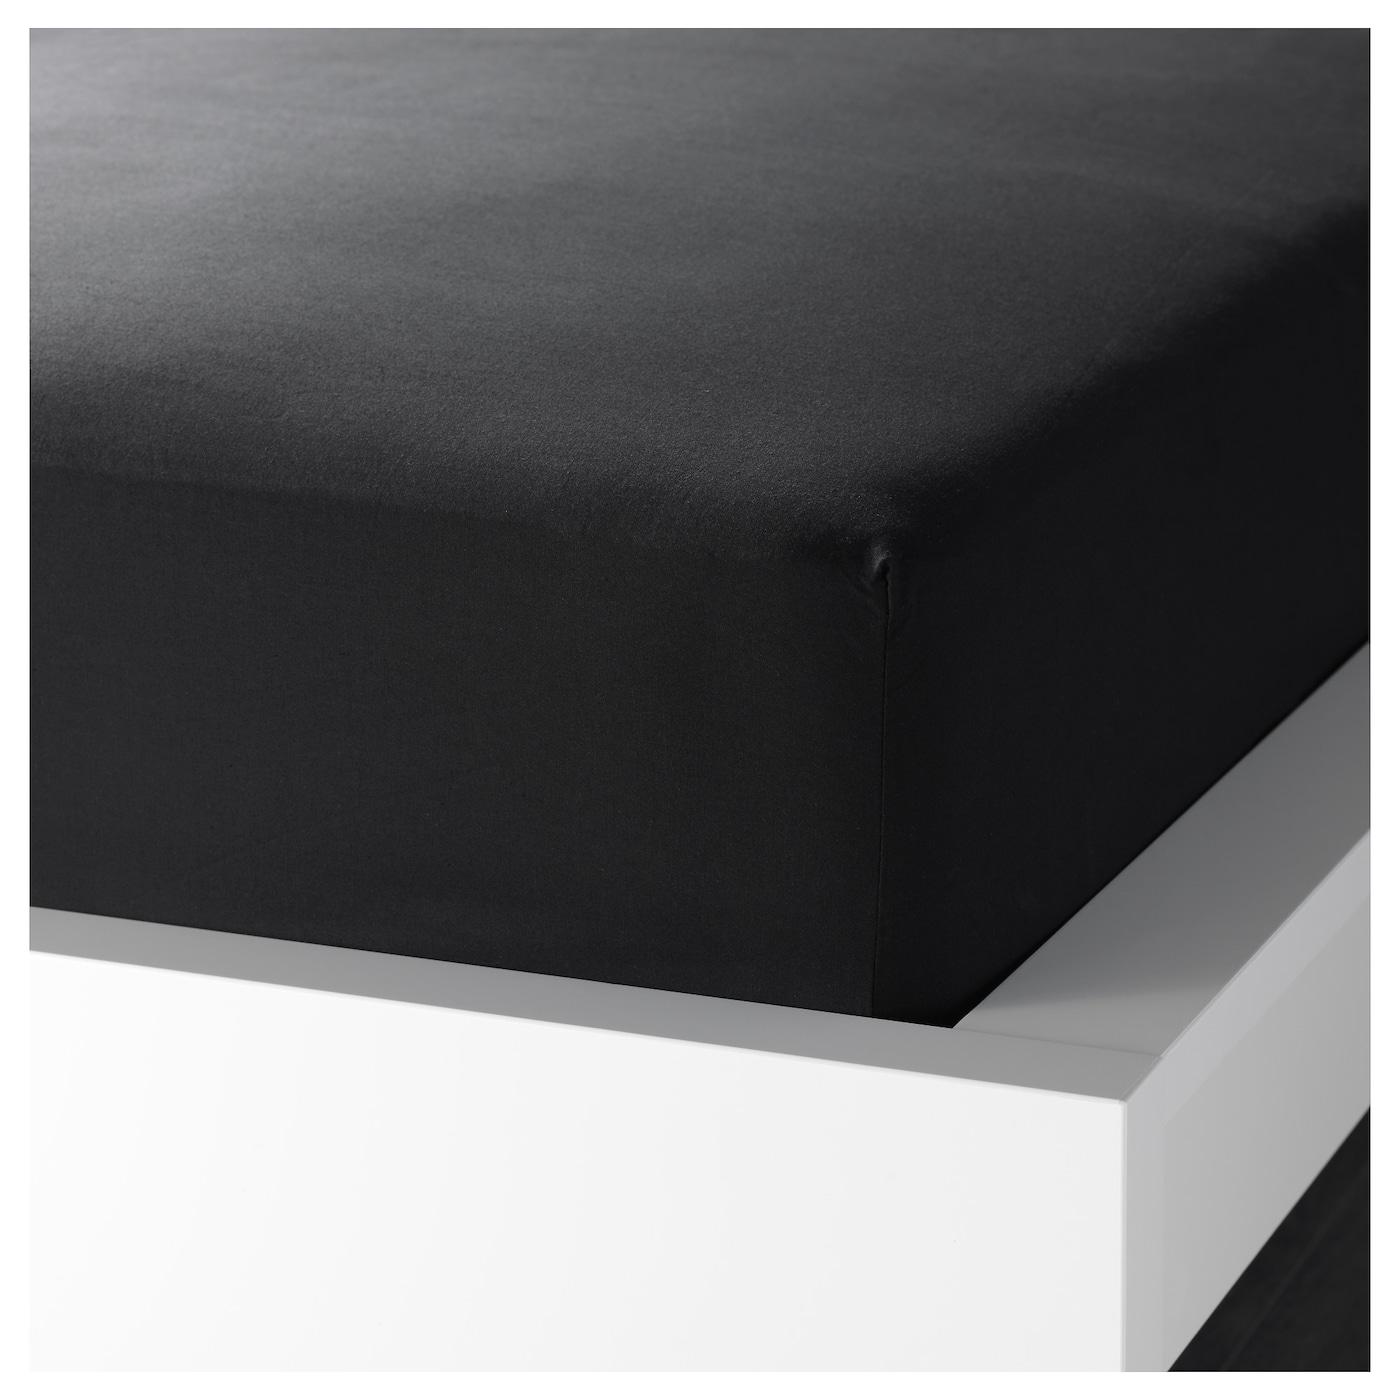 Drap housse, noir, 80x200 cm ○ DVALA - IKEA